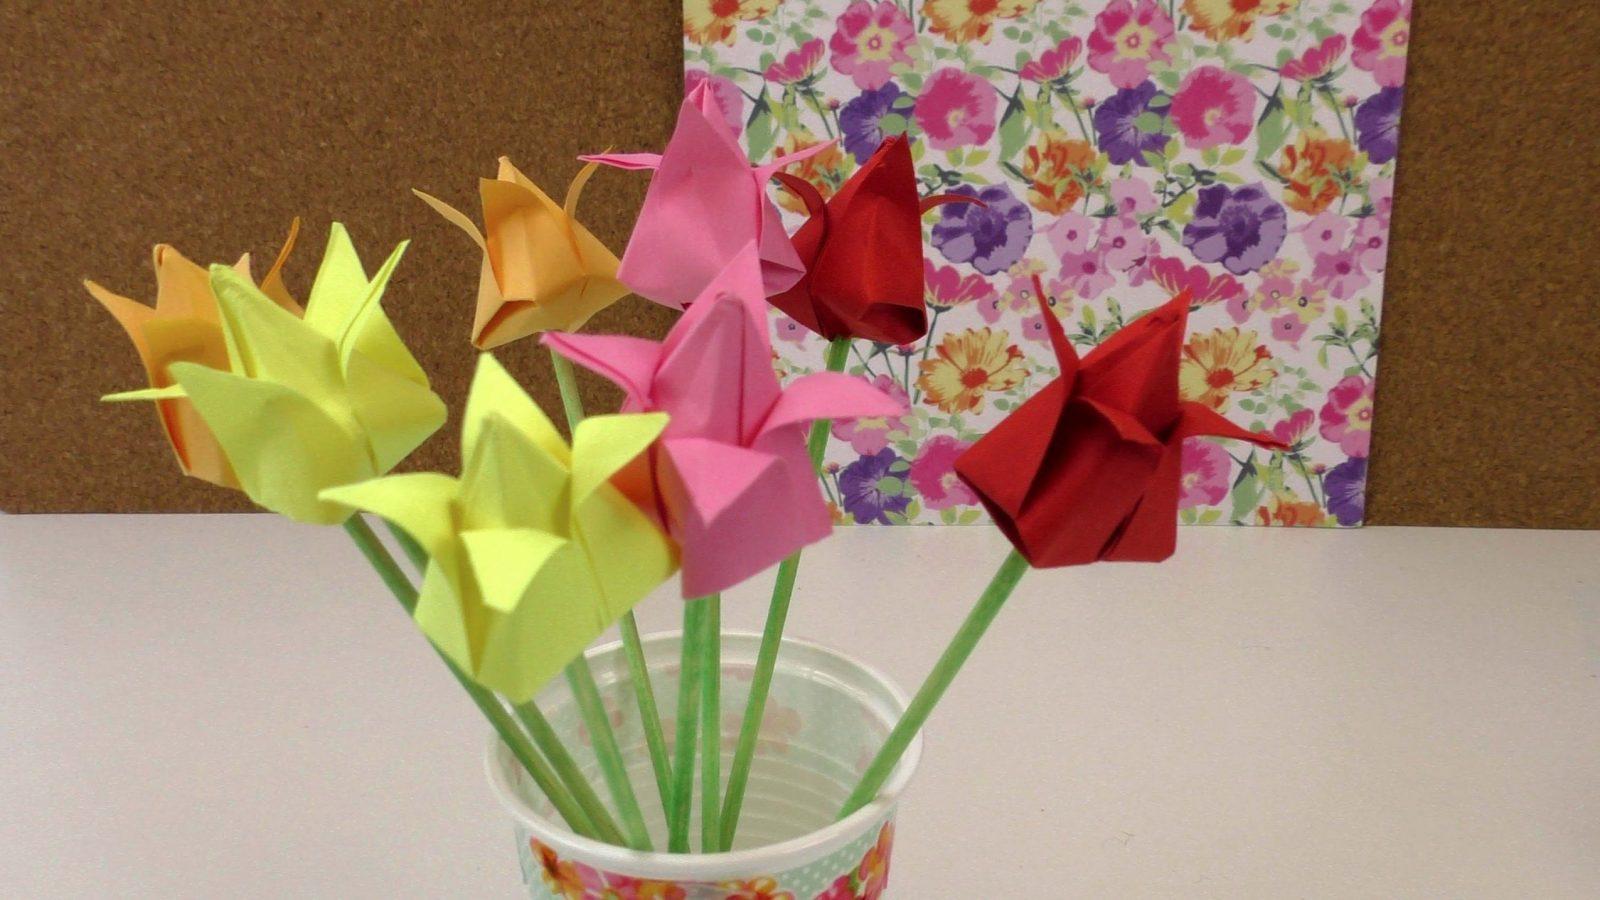 Origami Tulpen Diy  Blumen Falten Anleitung  Deko Einfach Und von Einfache Blumen Falten Anleitung Bild